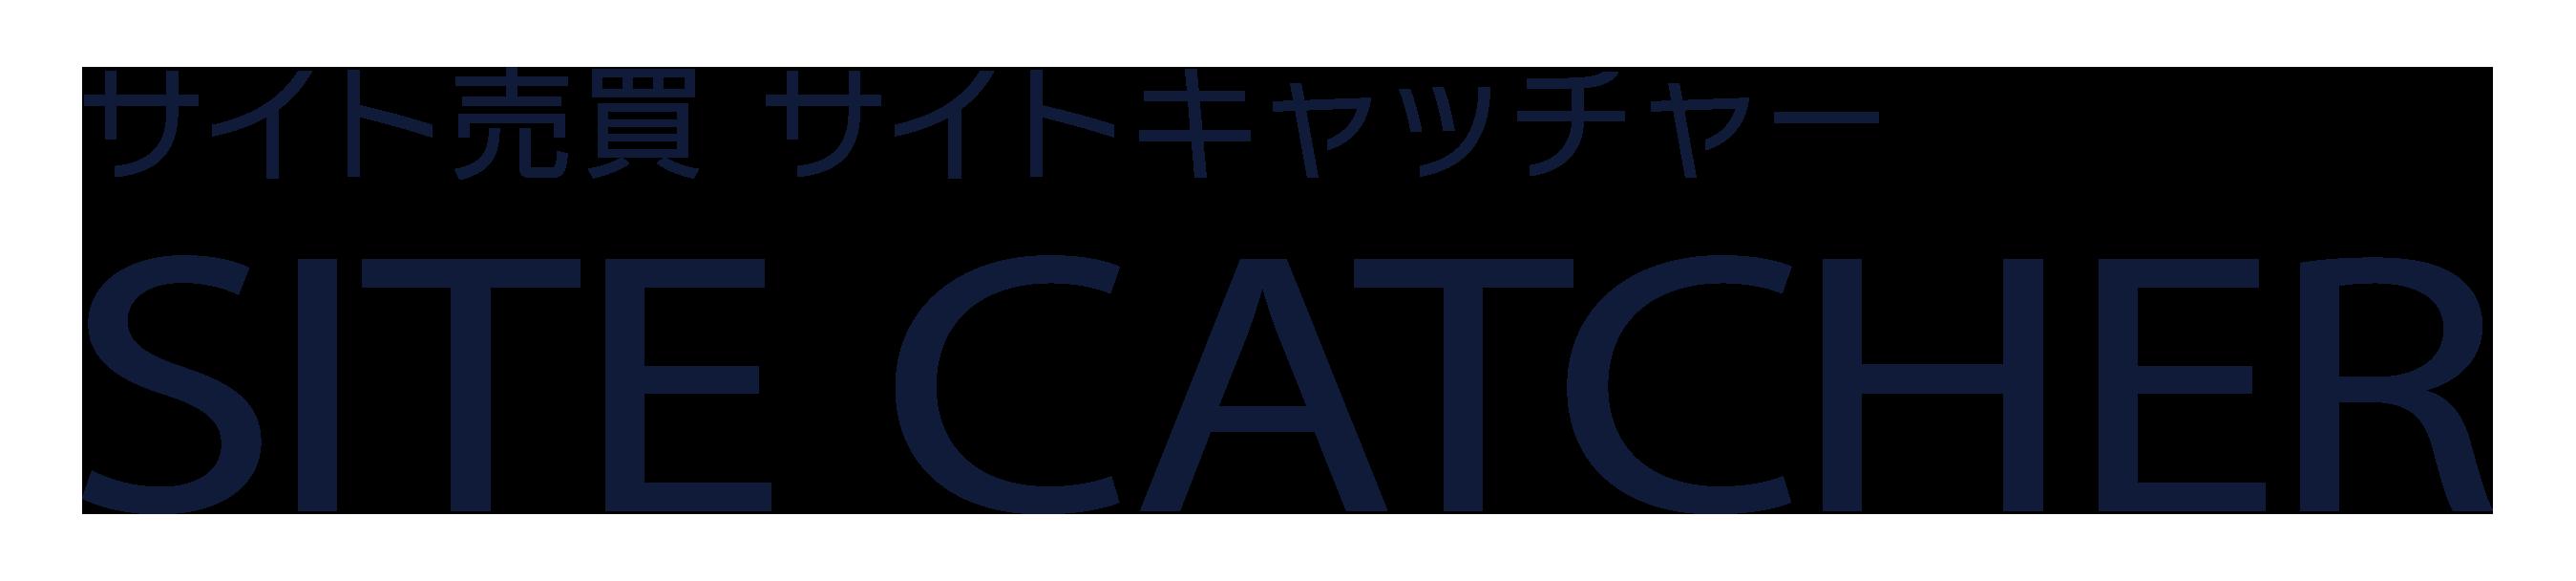 sitecatcher